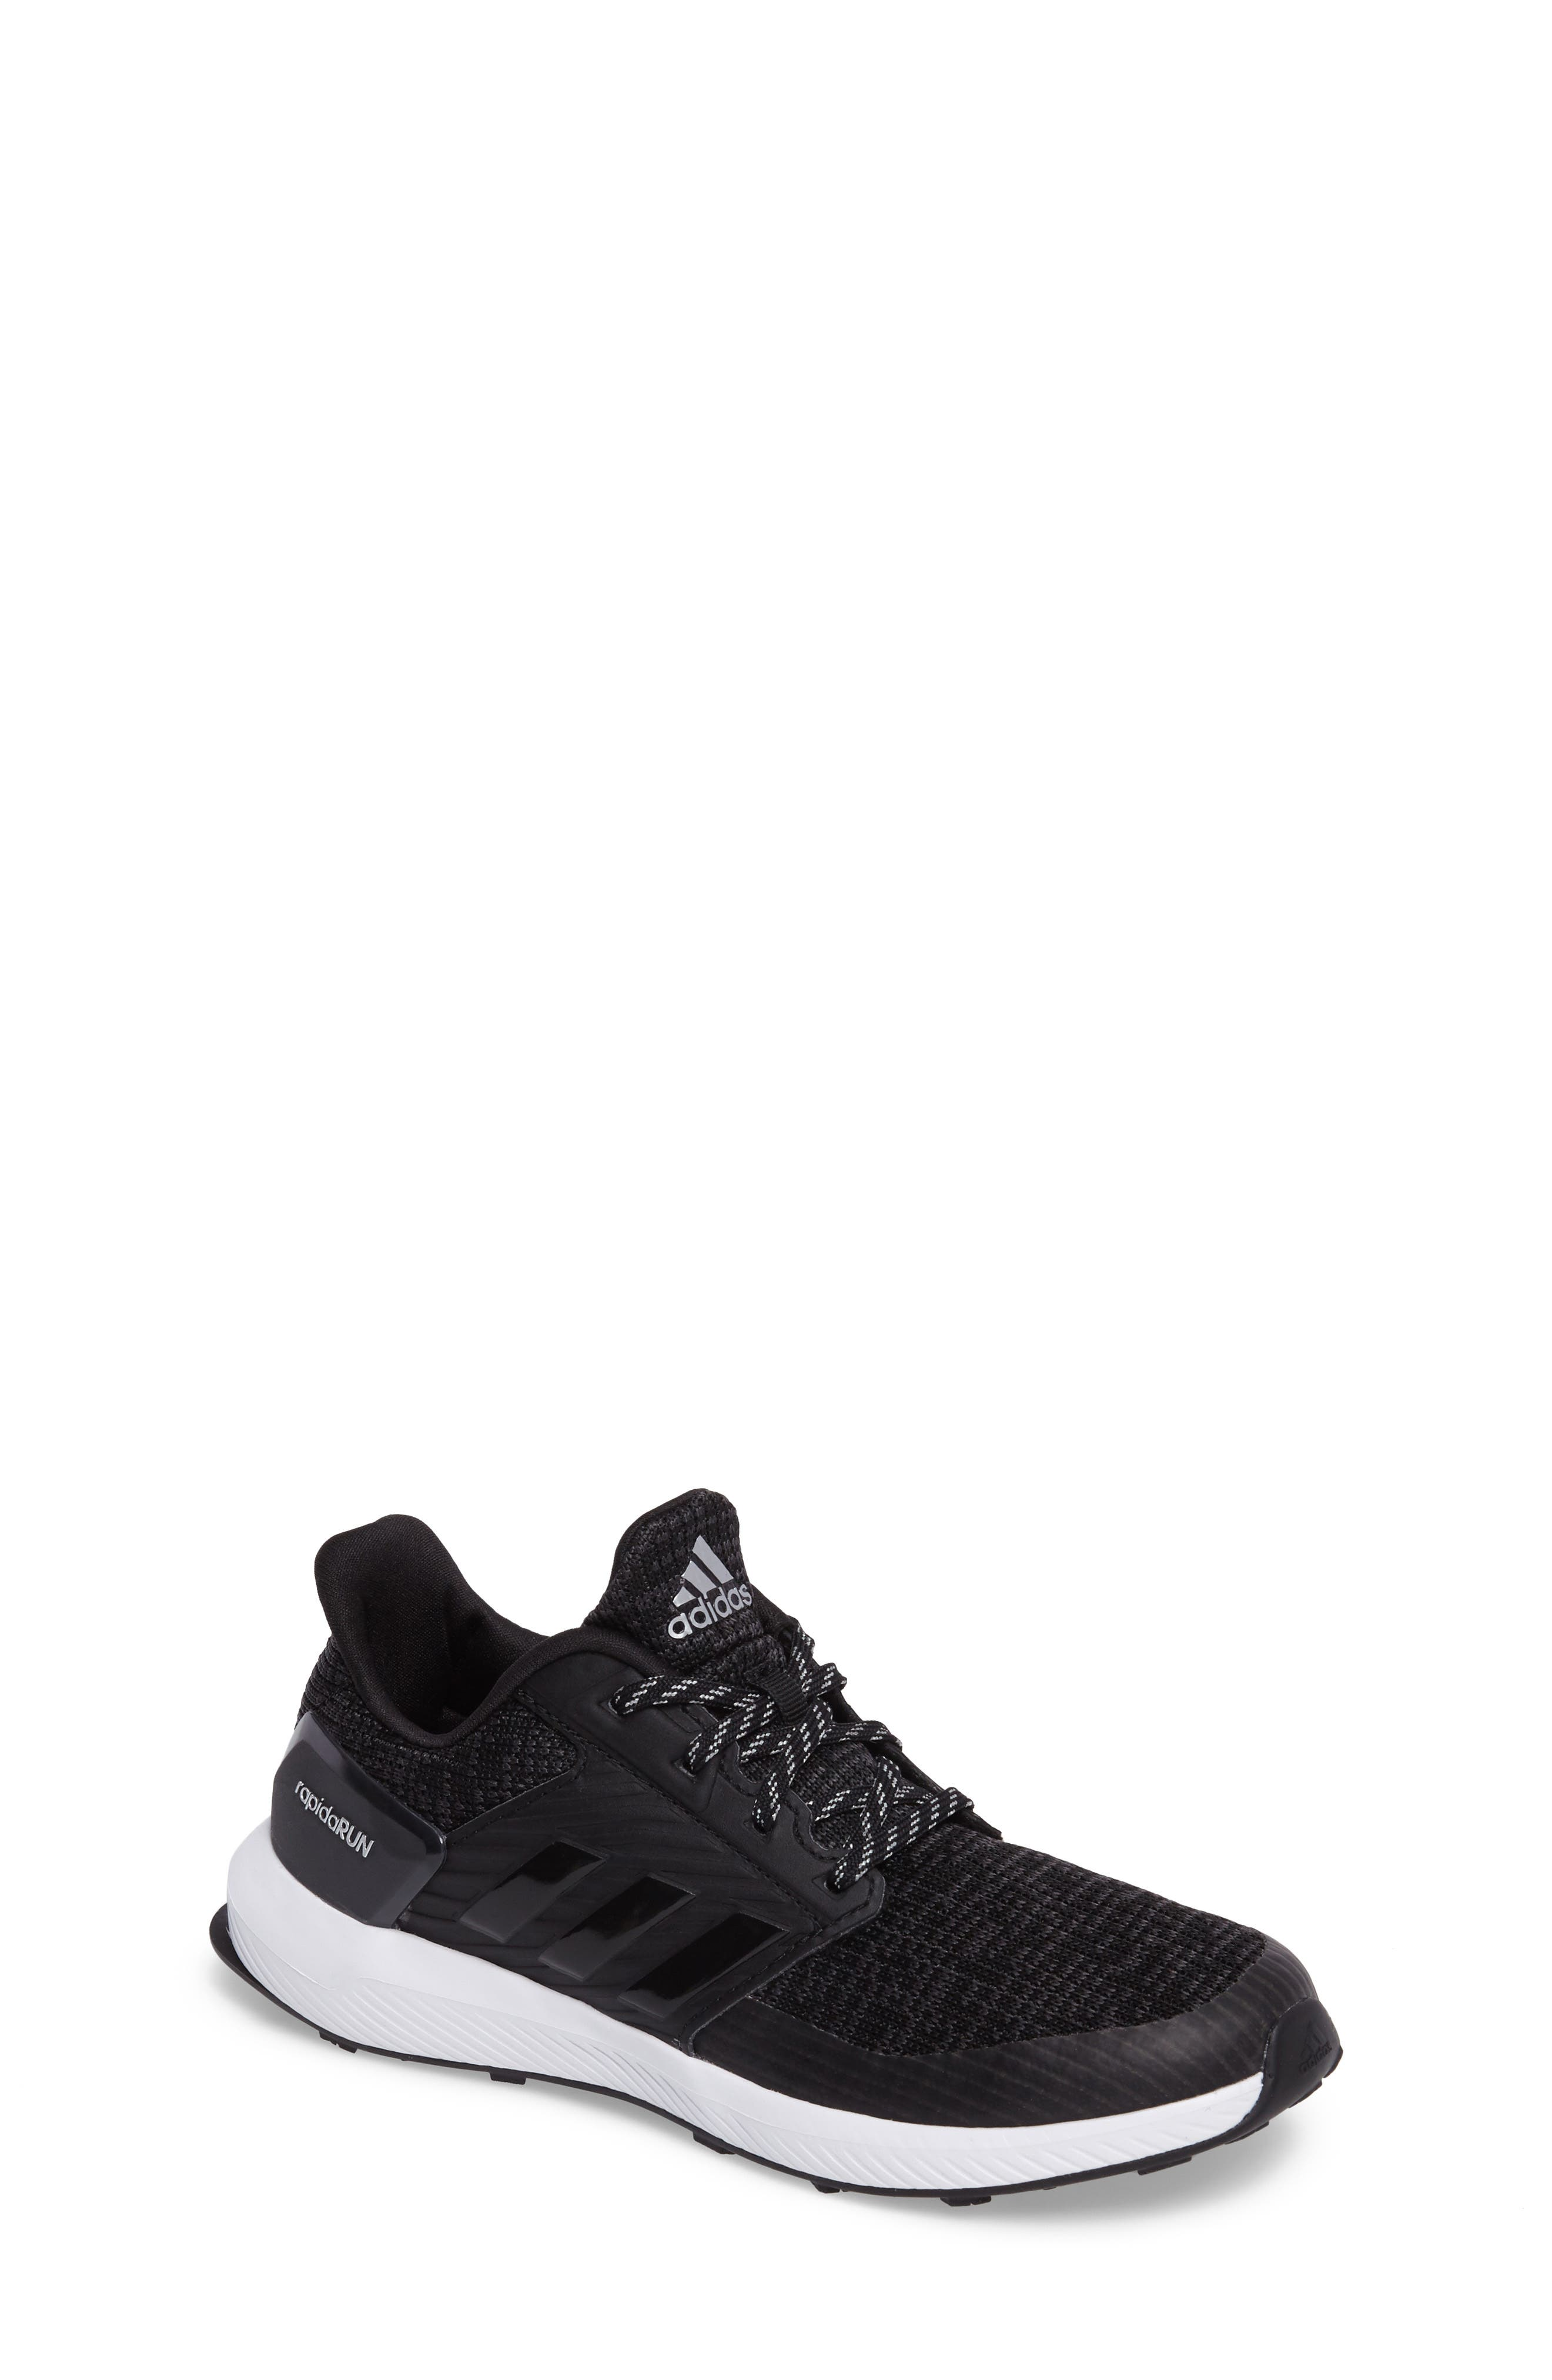 RapidaRUN Lux Sneaker,                         Main,                         color, 001